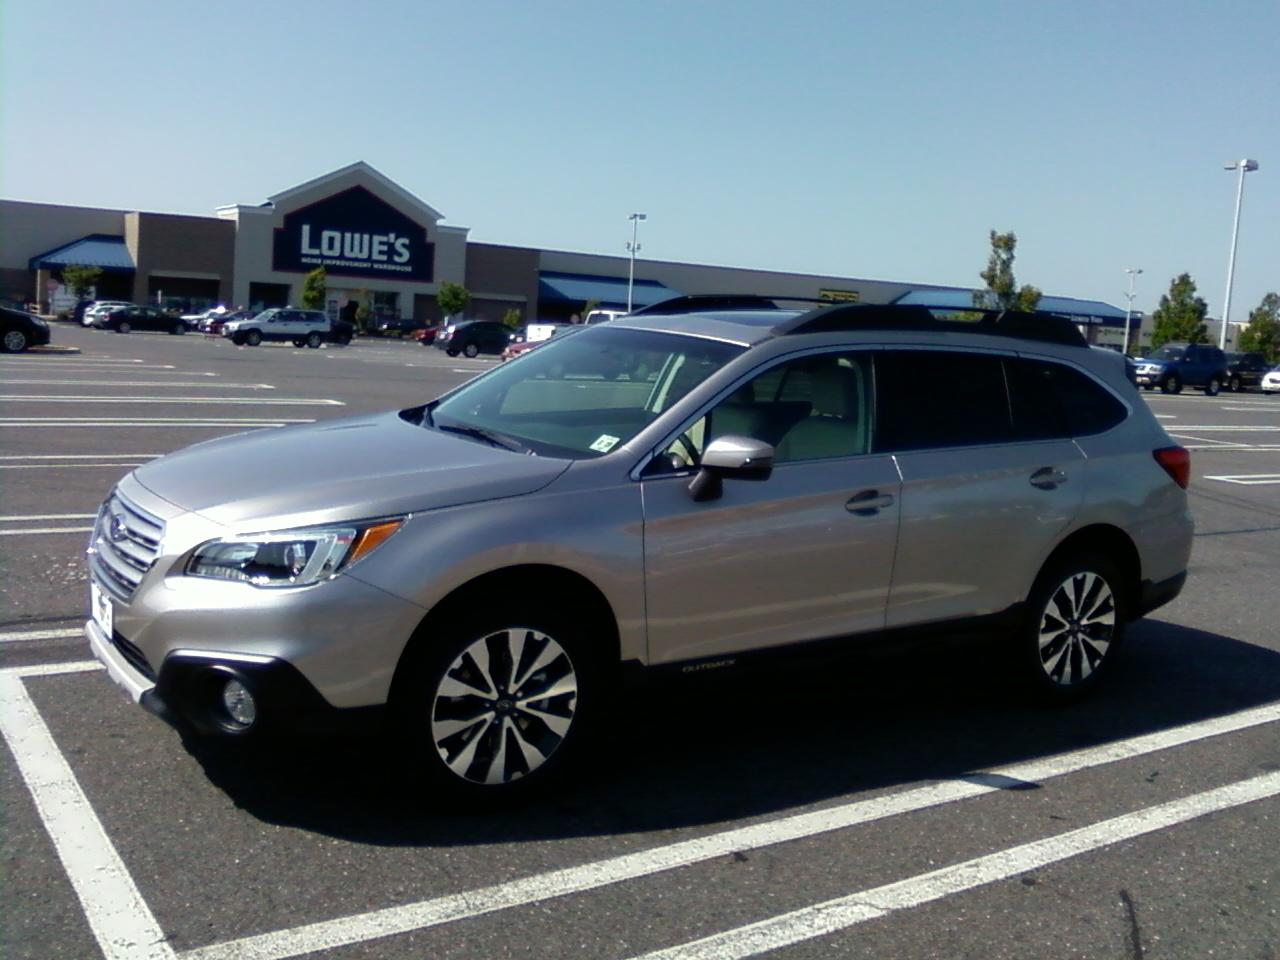 Subaru Outback Vs Impreza >> Tungsten Metallic vs. Burnished Bronze Metallic - Subaru Outback - Subaru Outback Forums